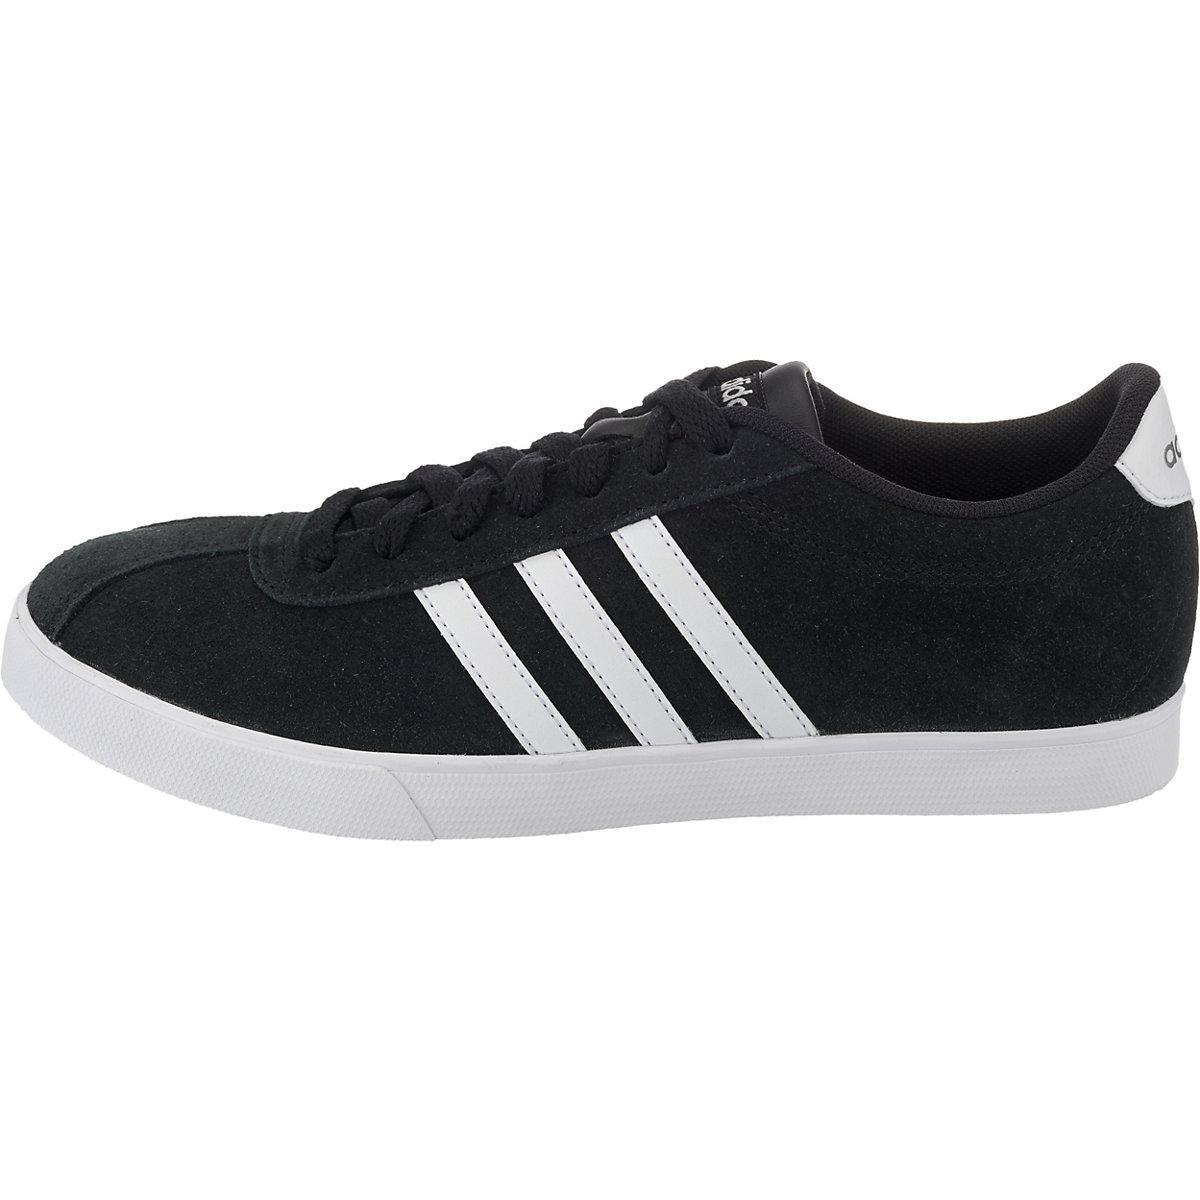 Adidas Sport Inspired, Courtset Sneakers Low, Schwarz